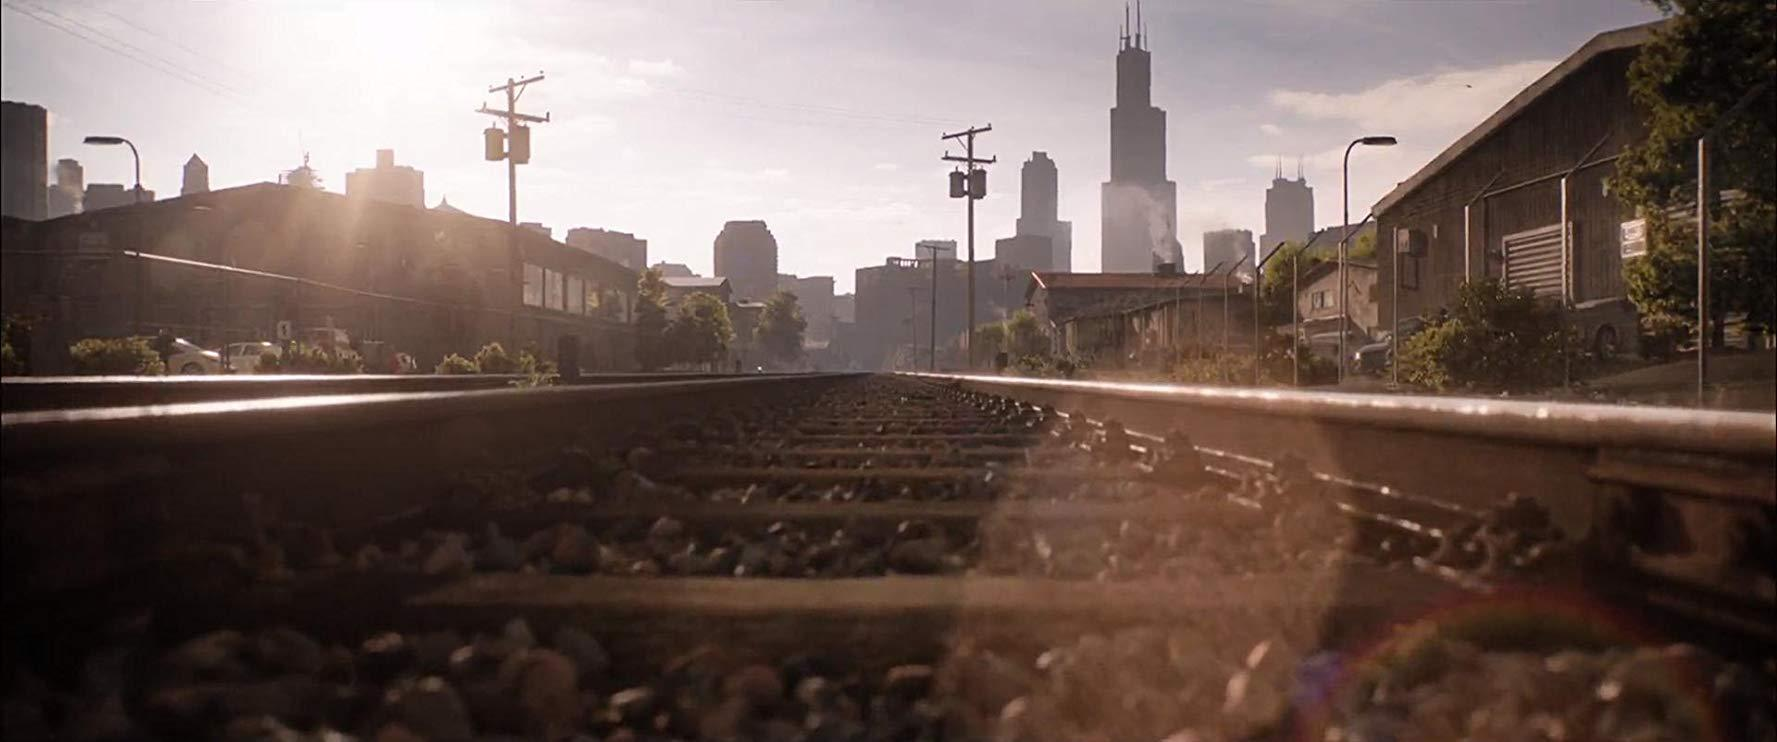 فيلم The Commuter 2018 مترجم